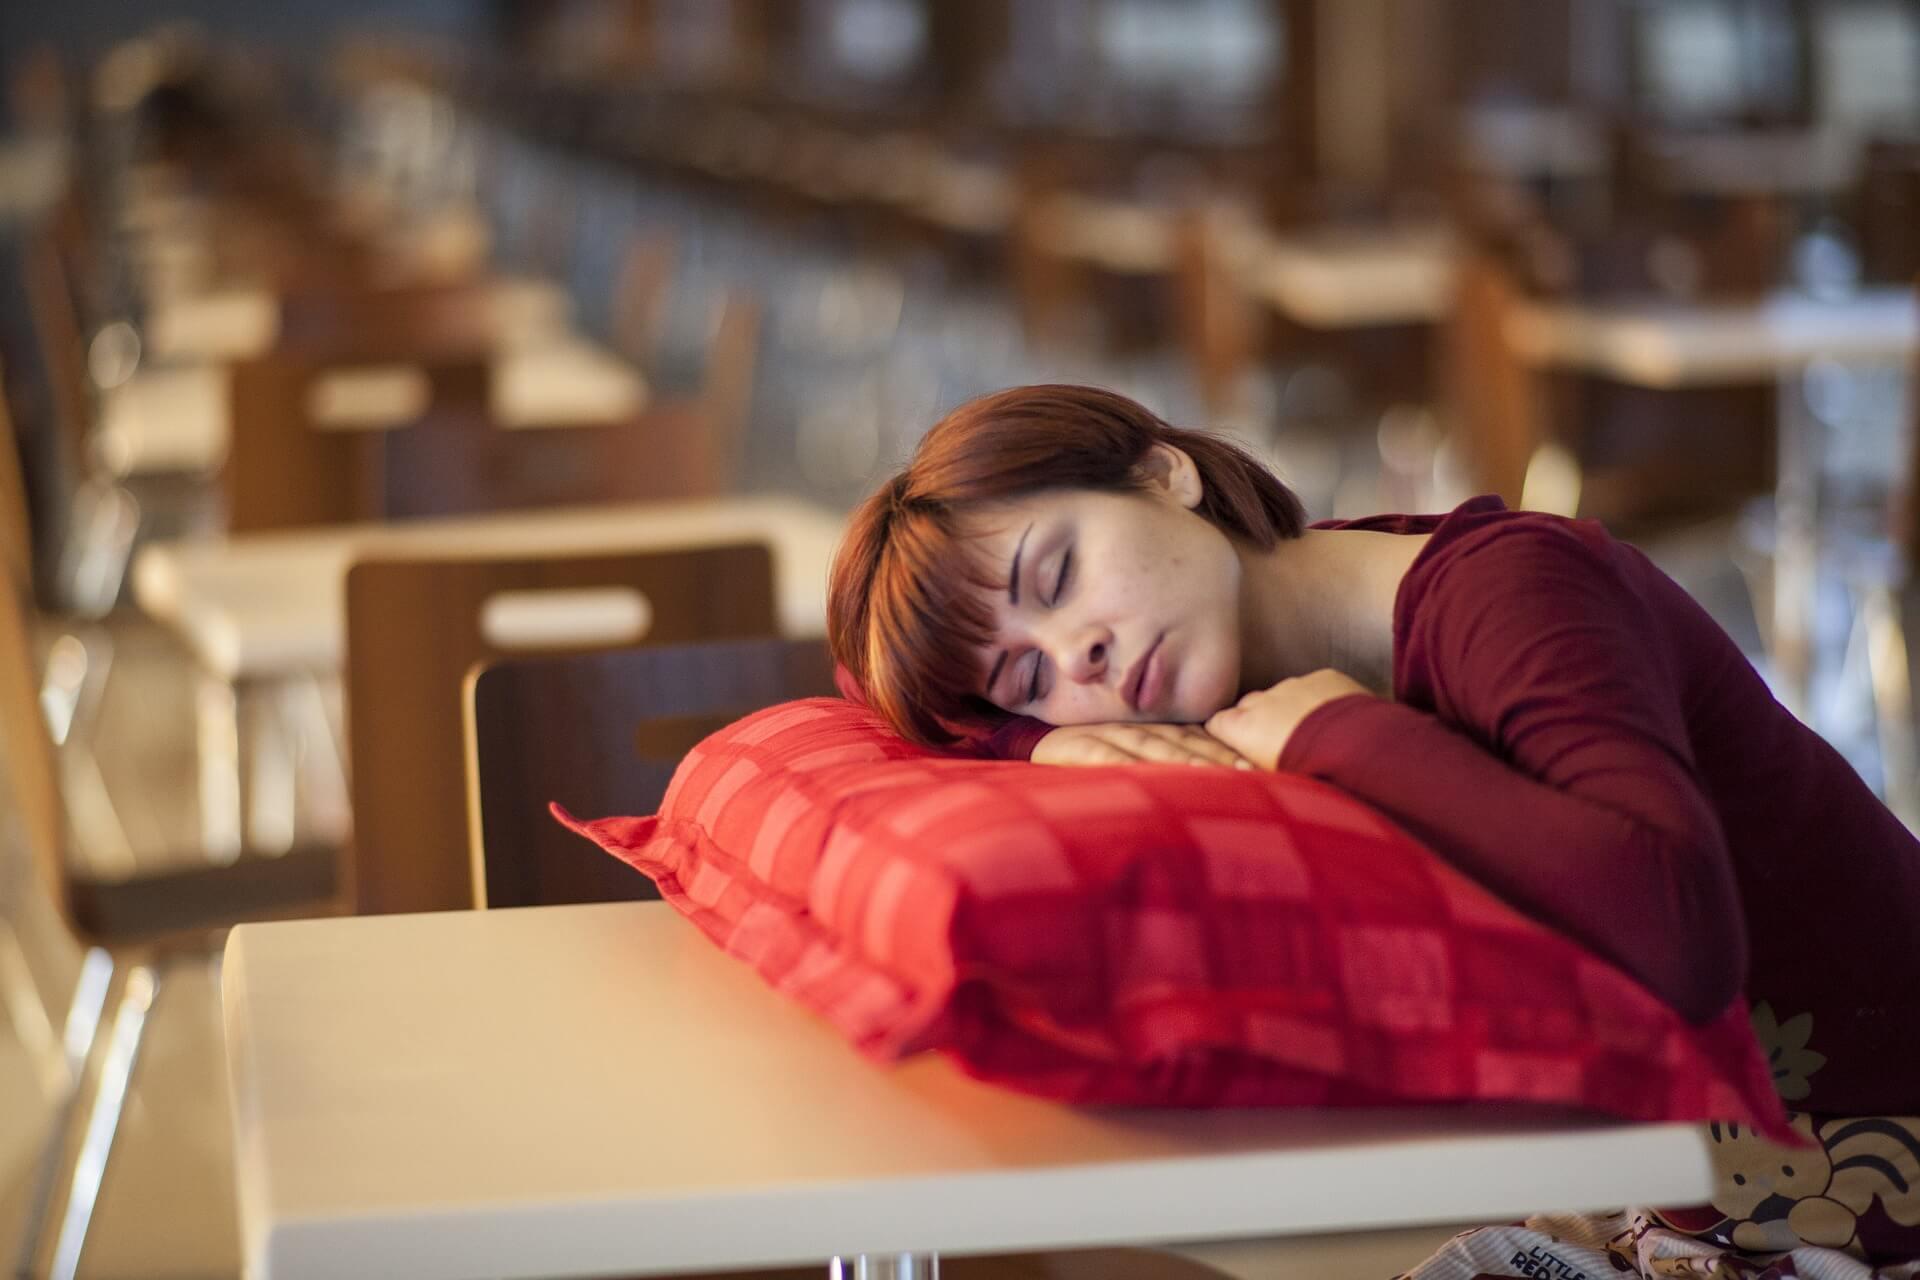 Woman asleep: Here's Why sleep matters